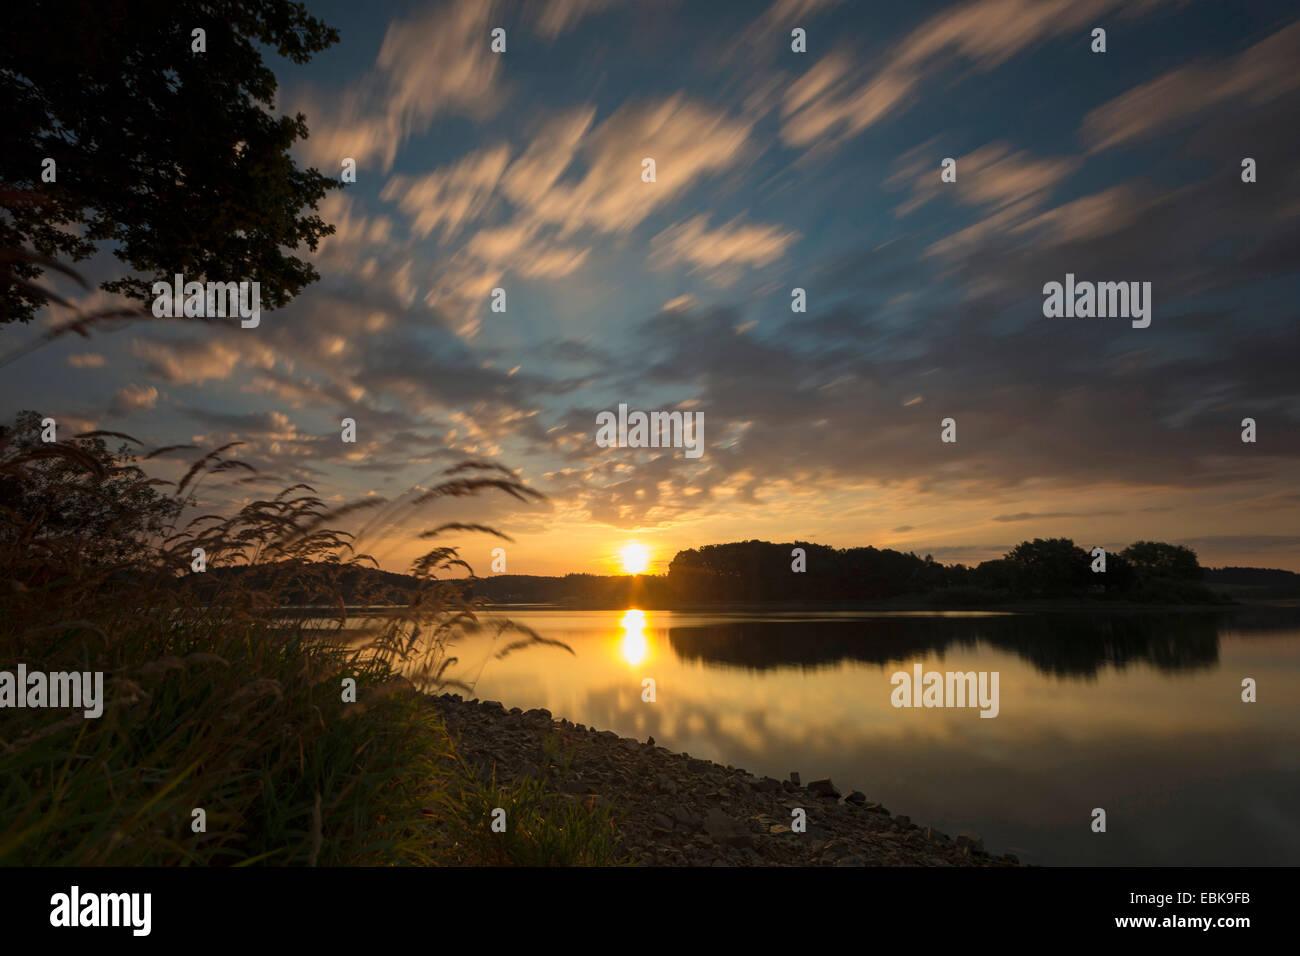 moving clouds over a lake, longtime exposure, Germany, Saxony, Vogtlaendische Schweiz, Jocketa, Vogtland - Stock Image